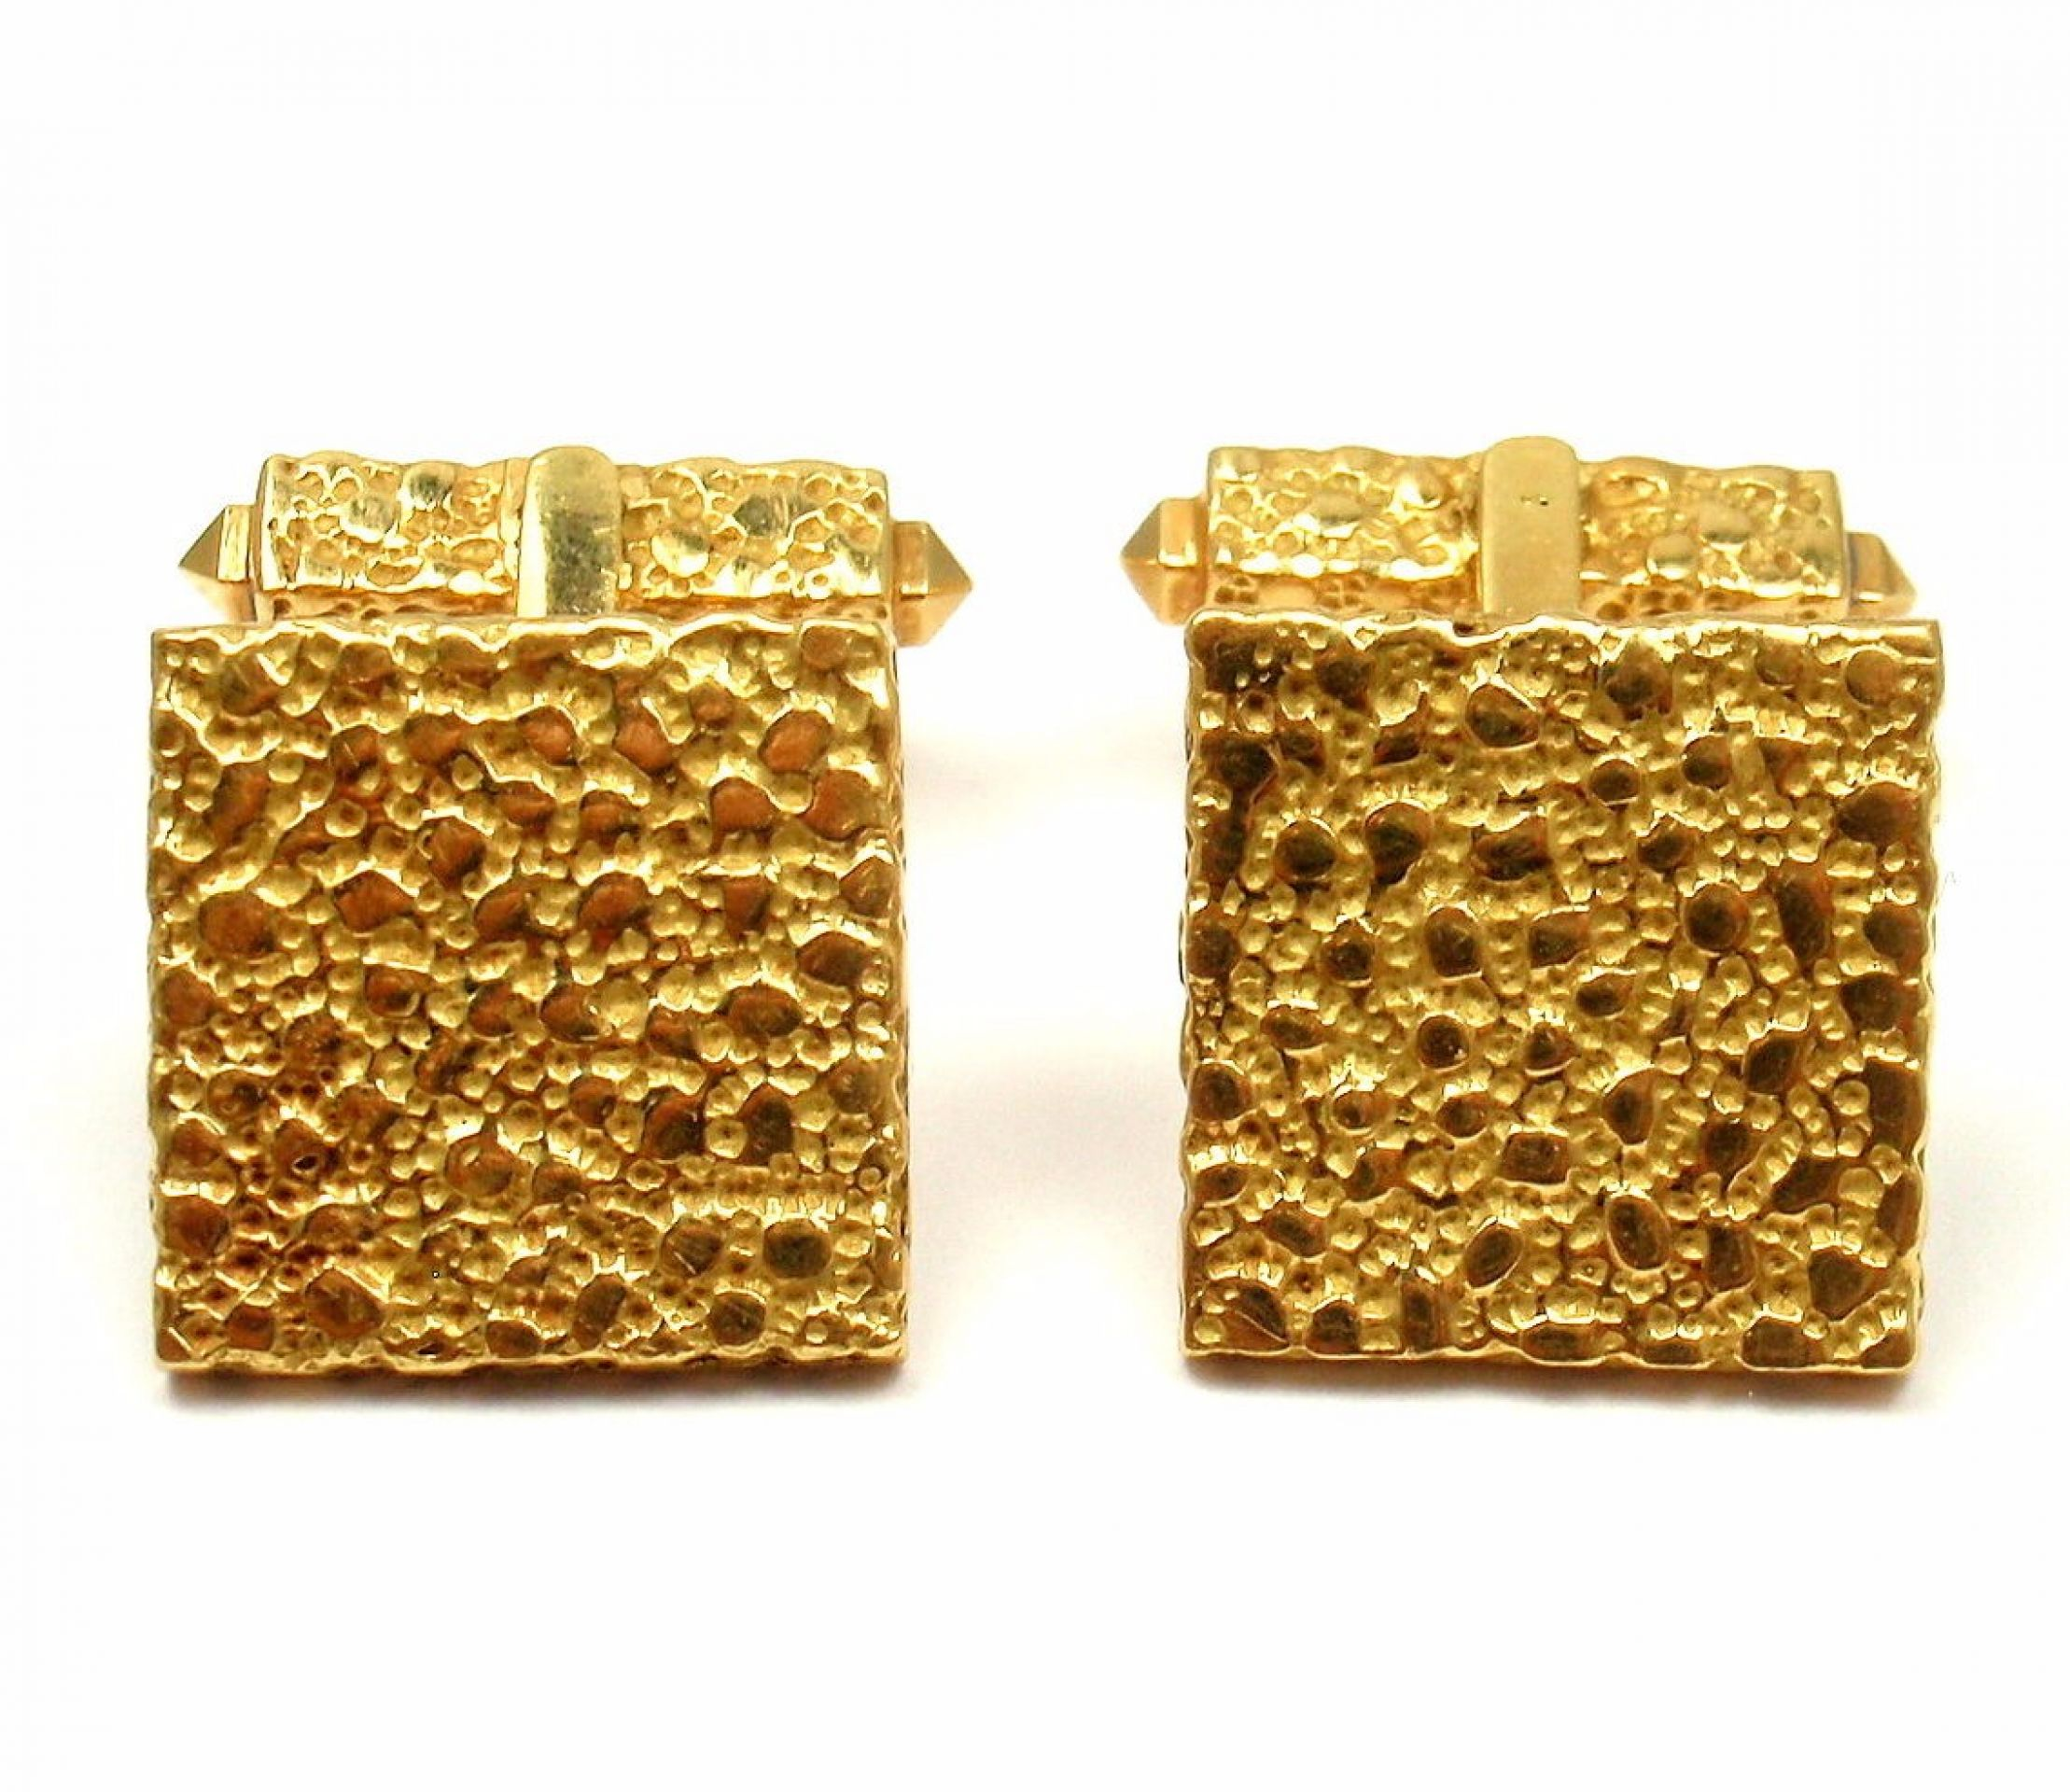 Vintage Cartier Belgium 18k Yellow Gold Nugget Mens Cufflinks